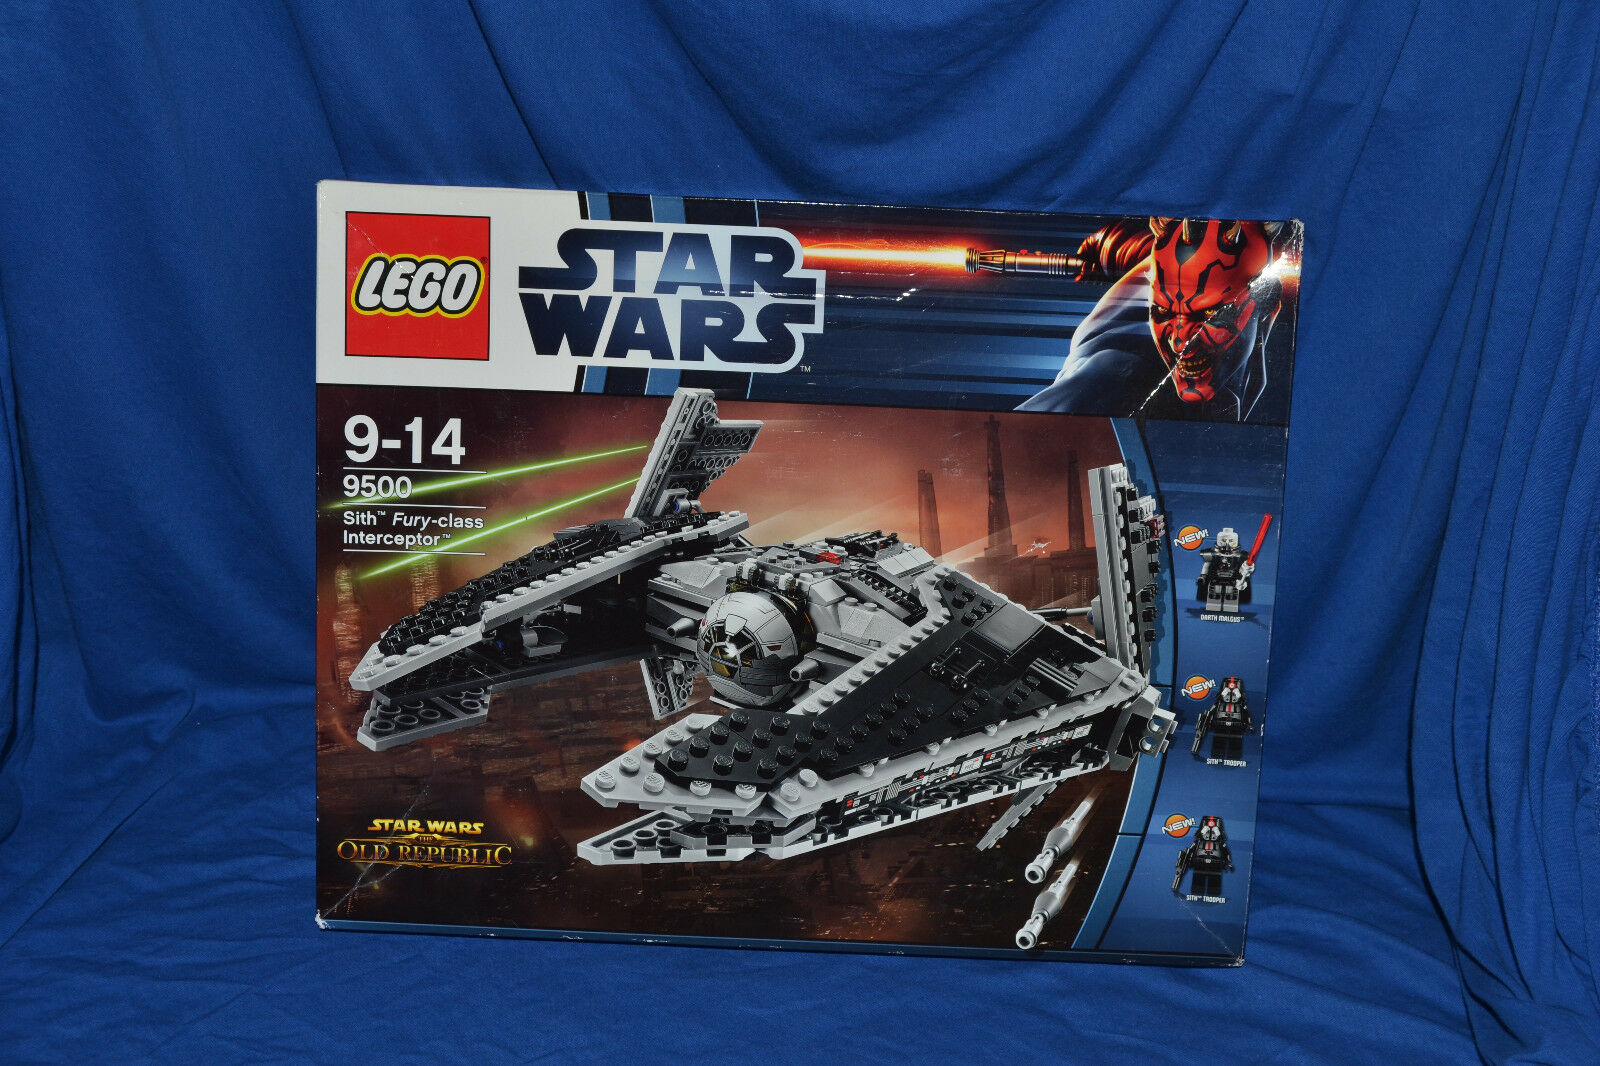 LEGO Set 9500 Star Wars Sith Fury class Interceptor verschlossen sealed set